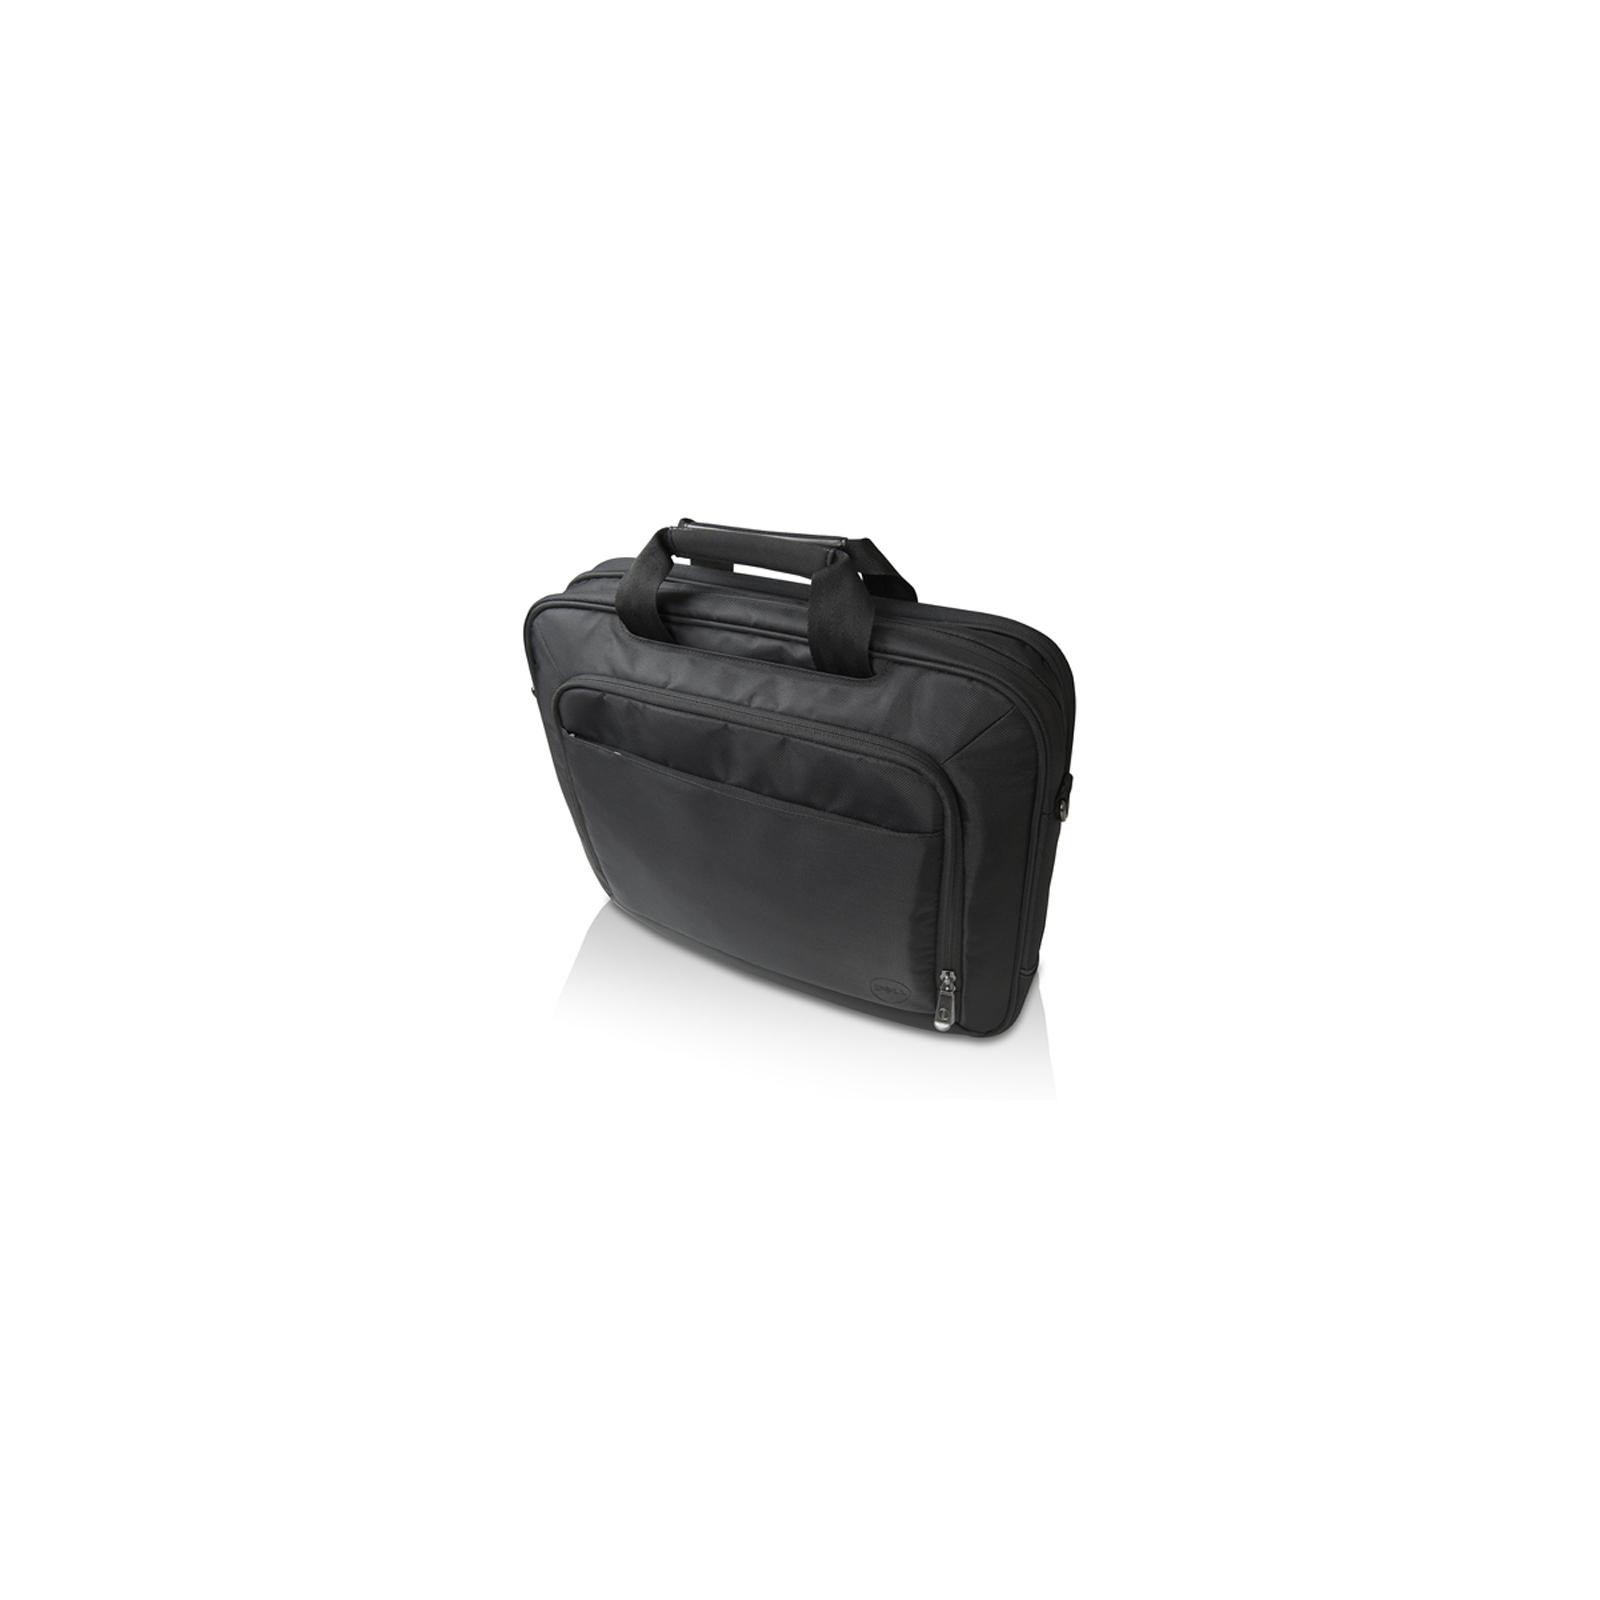 "Сумка для ноутбука Dell 15.6"" Topload (460-BBLR) изображение 3"